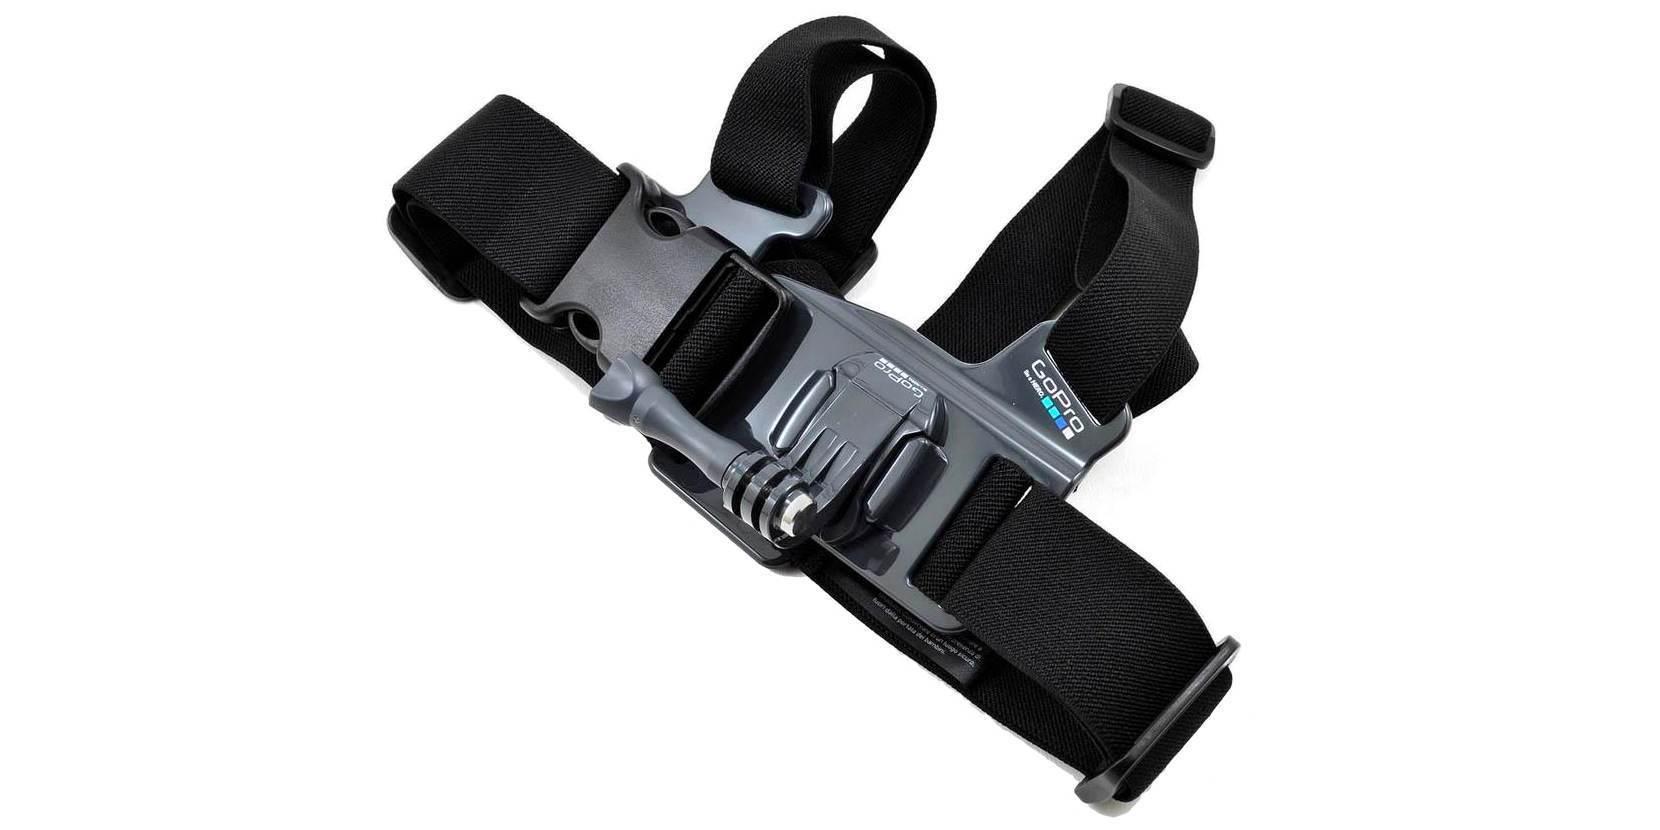 Детское крепление на грудь GoPro Jr. Chesty: Chest Harness (ACHMJ-301) вид сбоку